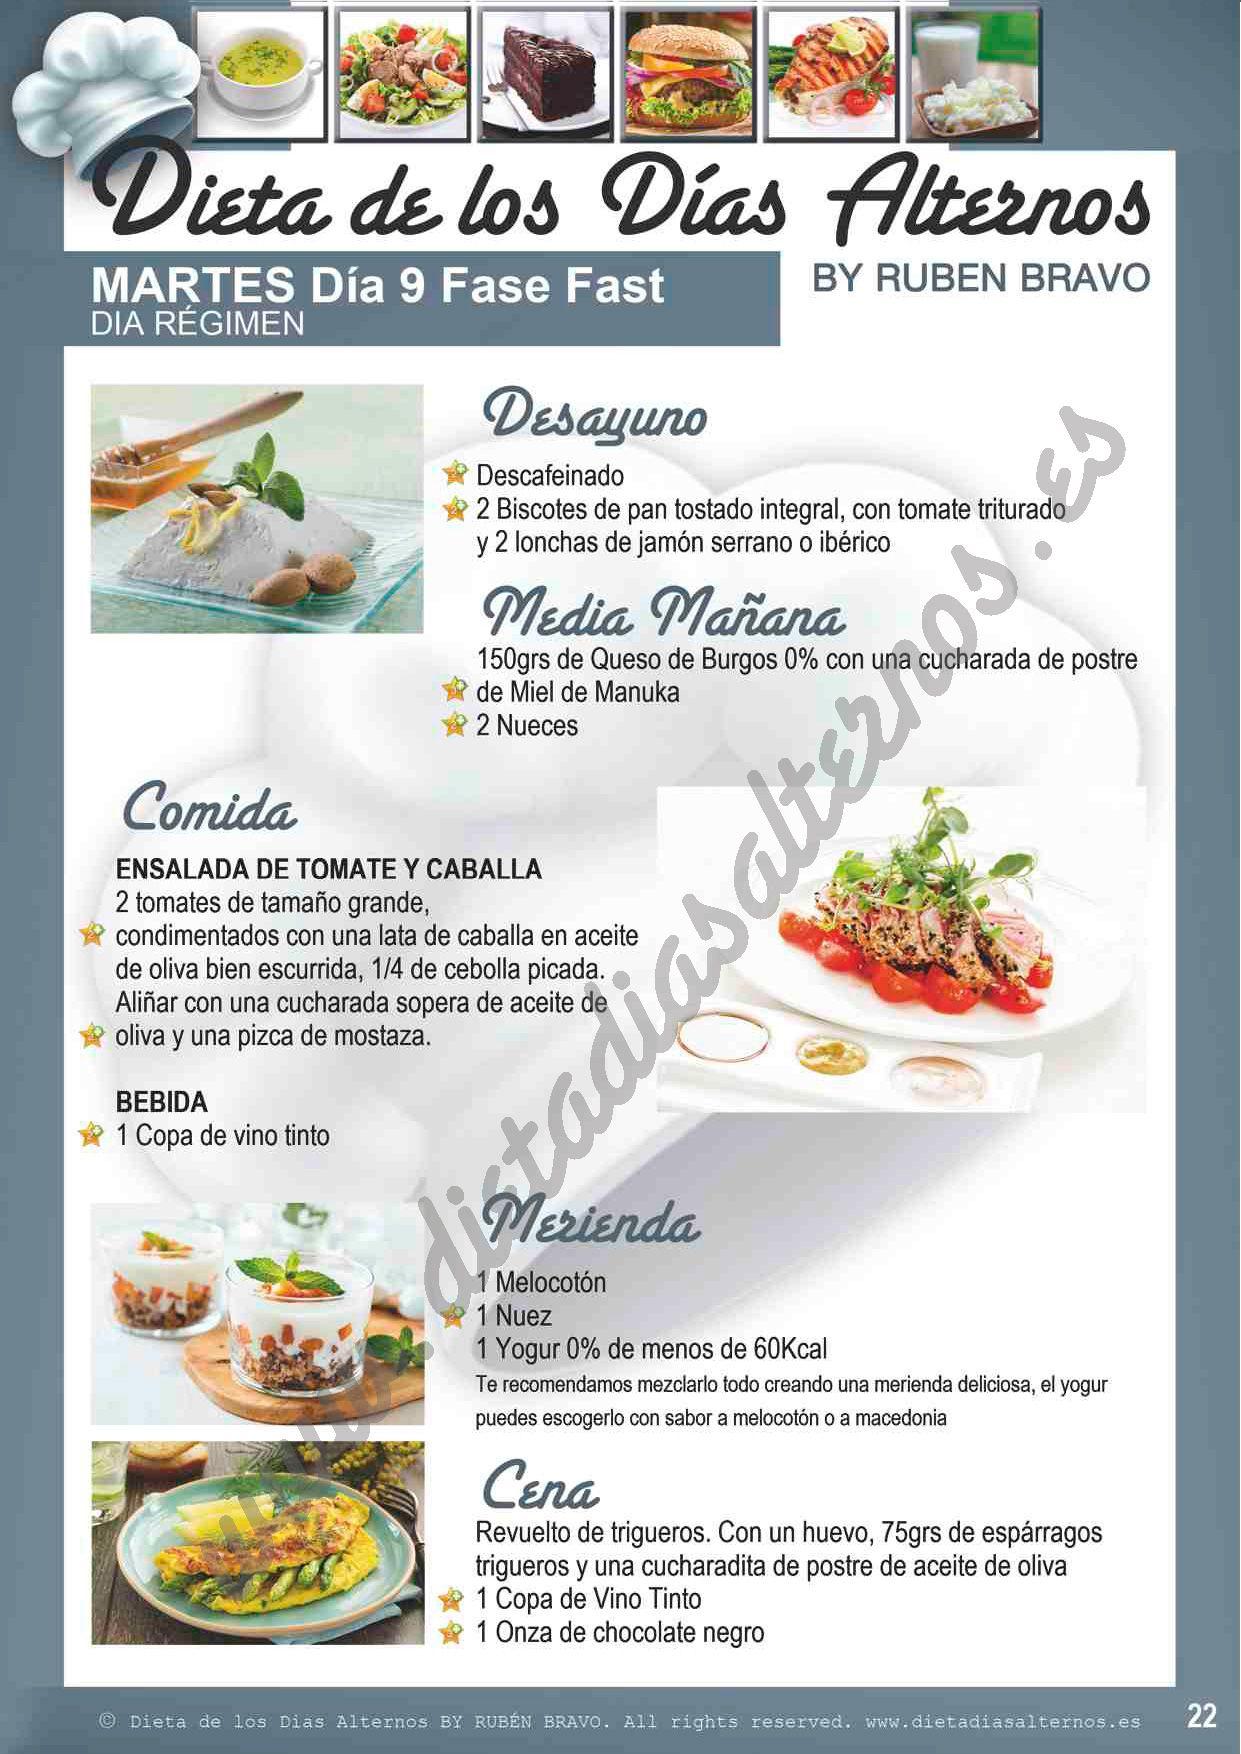 menus de la dieta del vino y el jamon